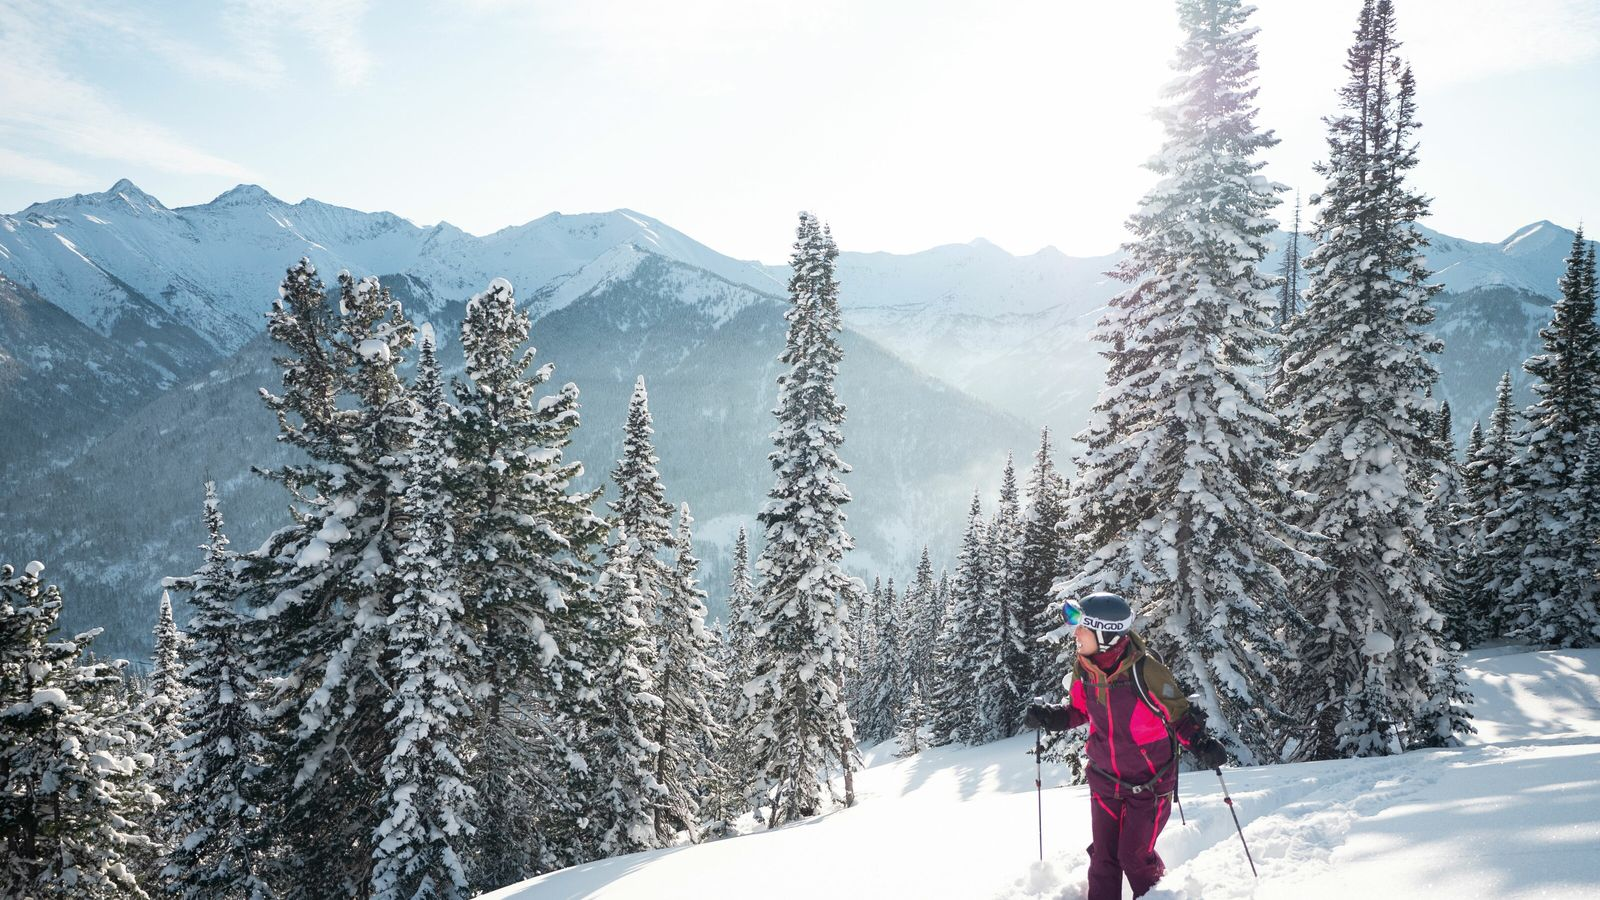 Fresh, deep Siberian powder snow overs the slopes at Khamar-Daban.